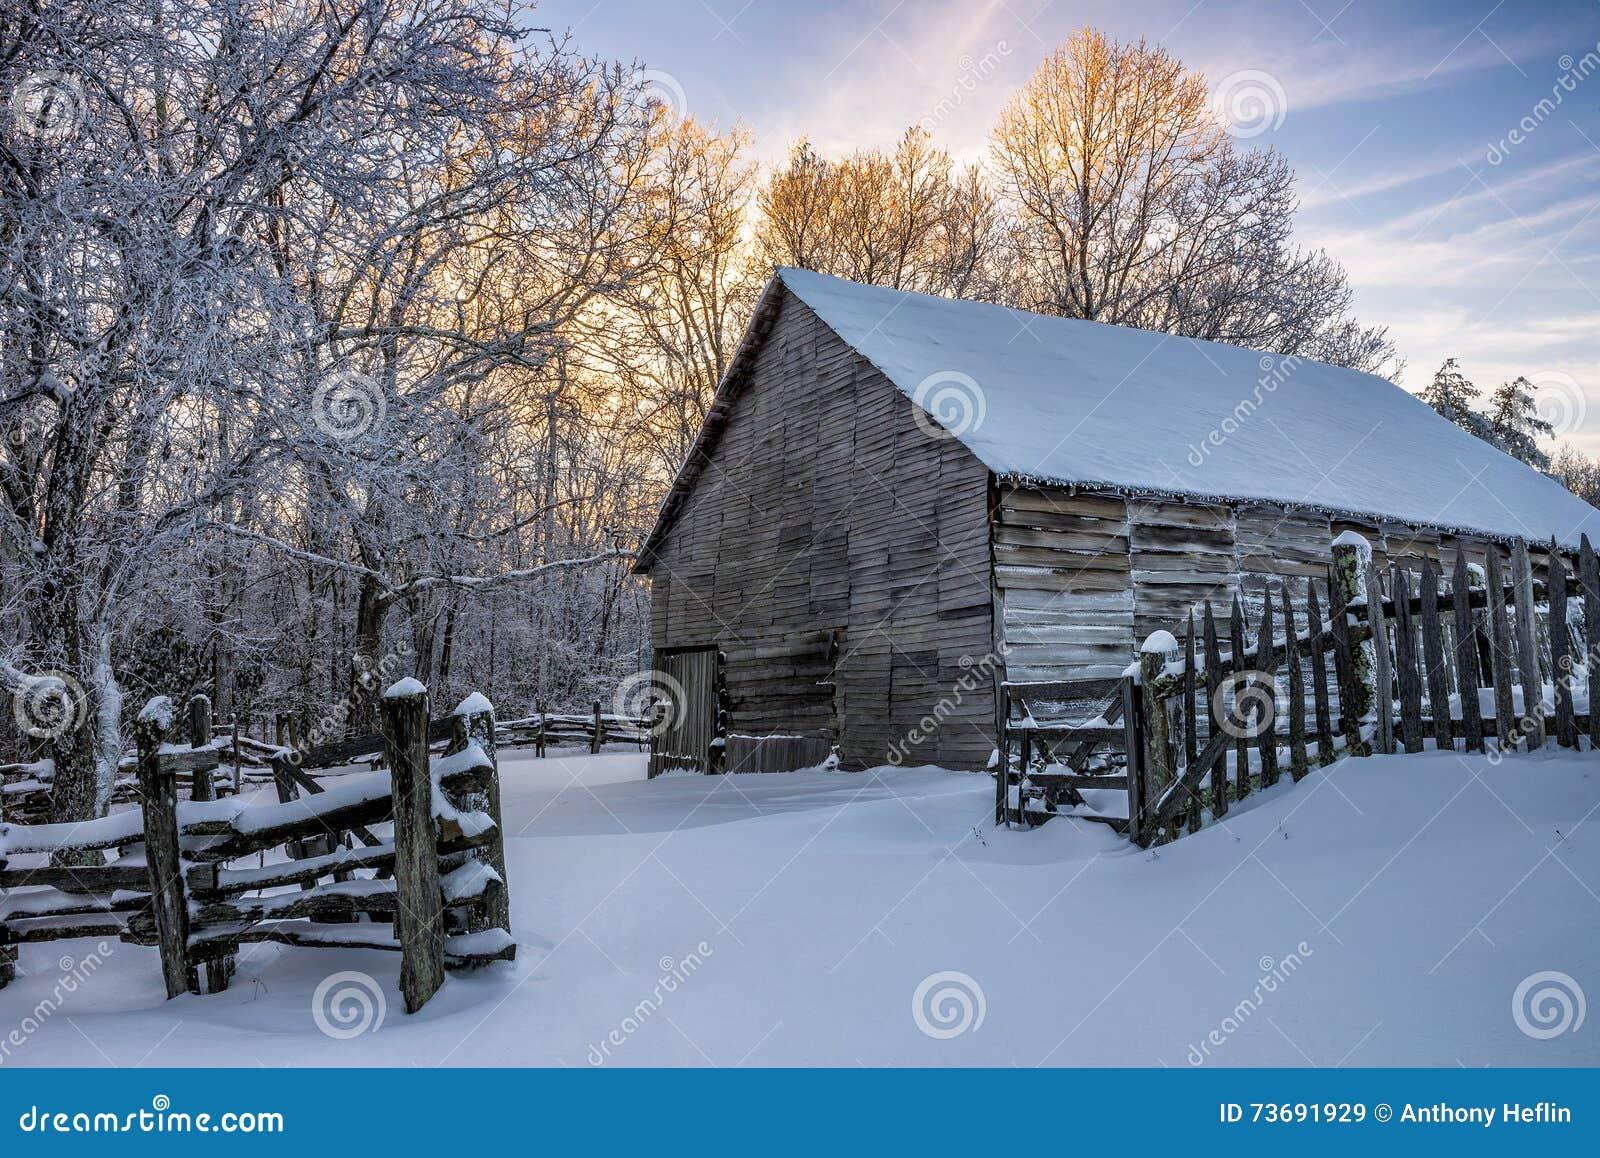 Primitive Barn, Winter Scenic, Cumberland Gap National Park